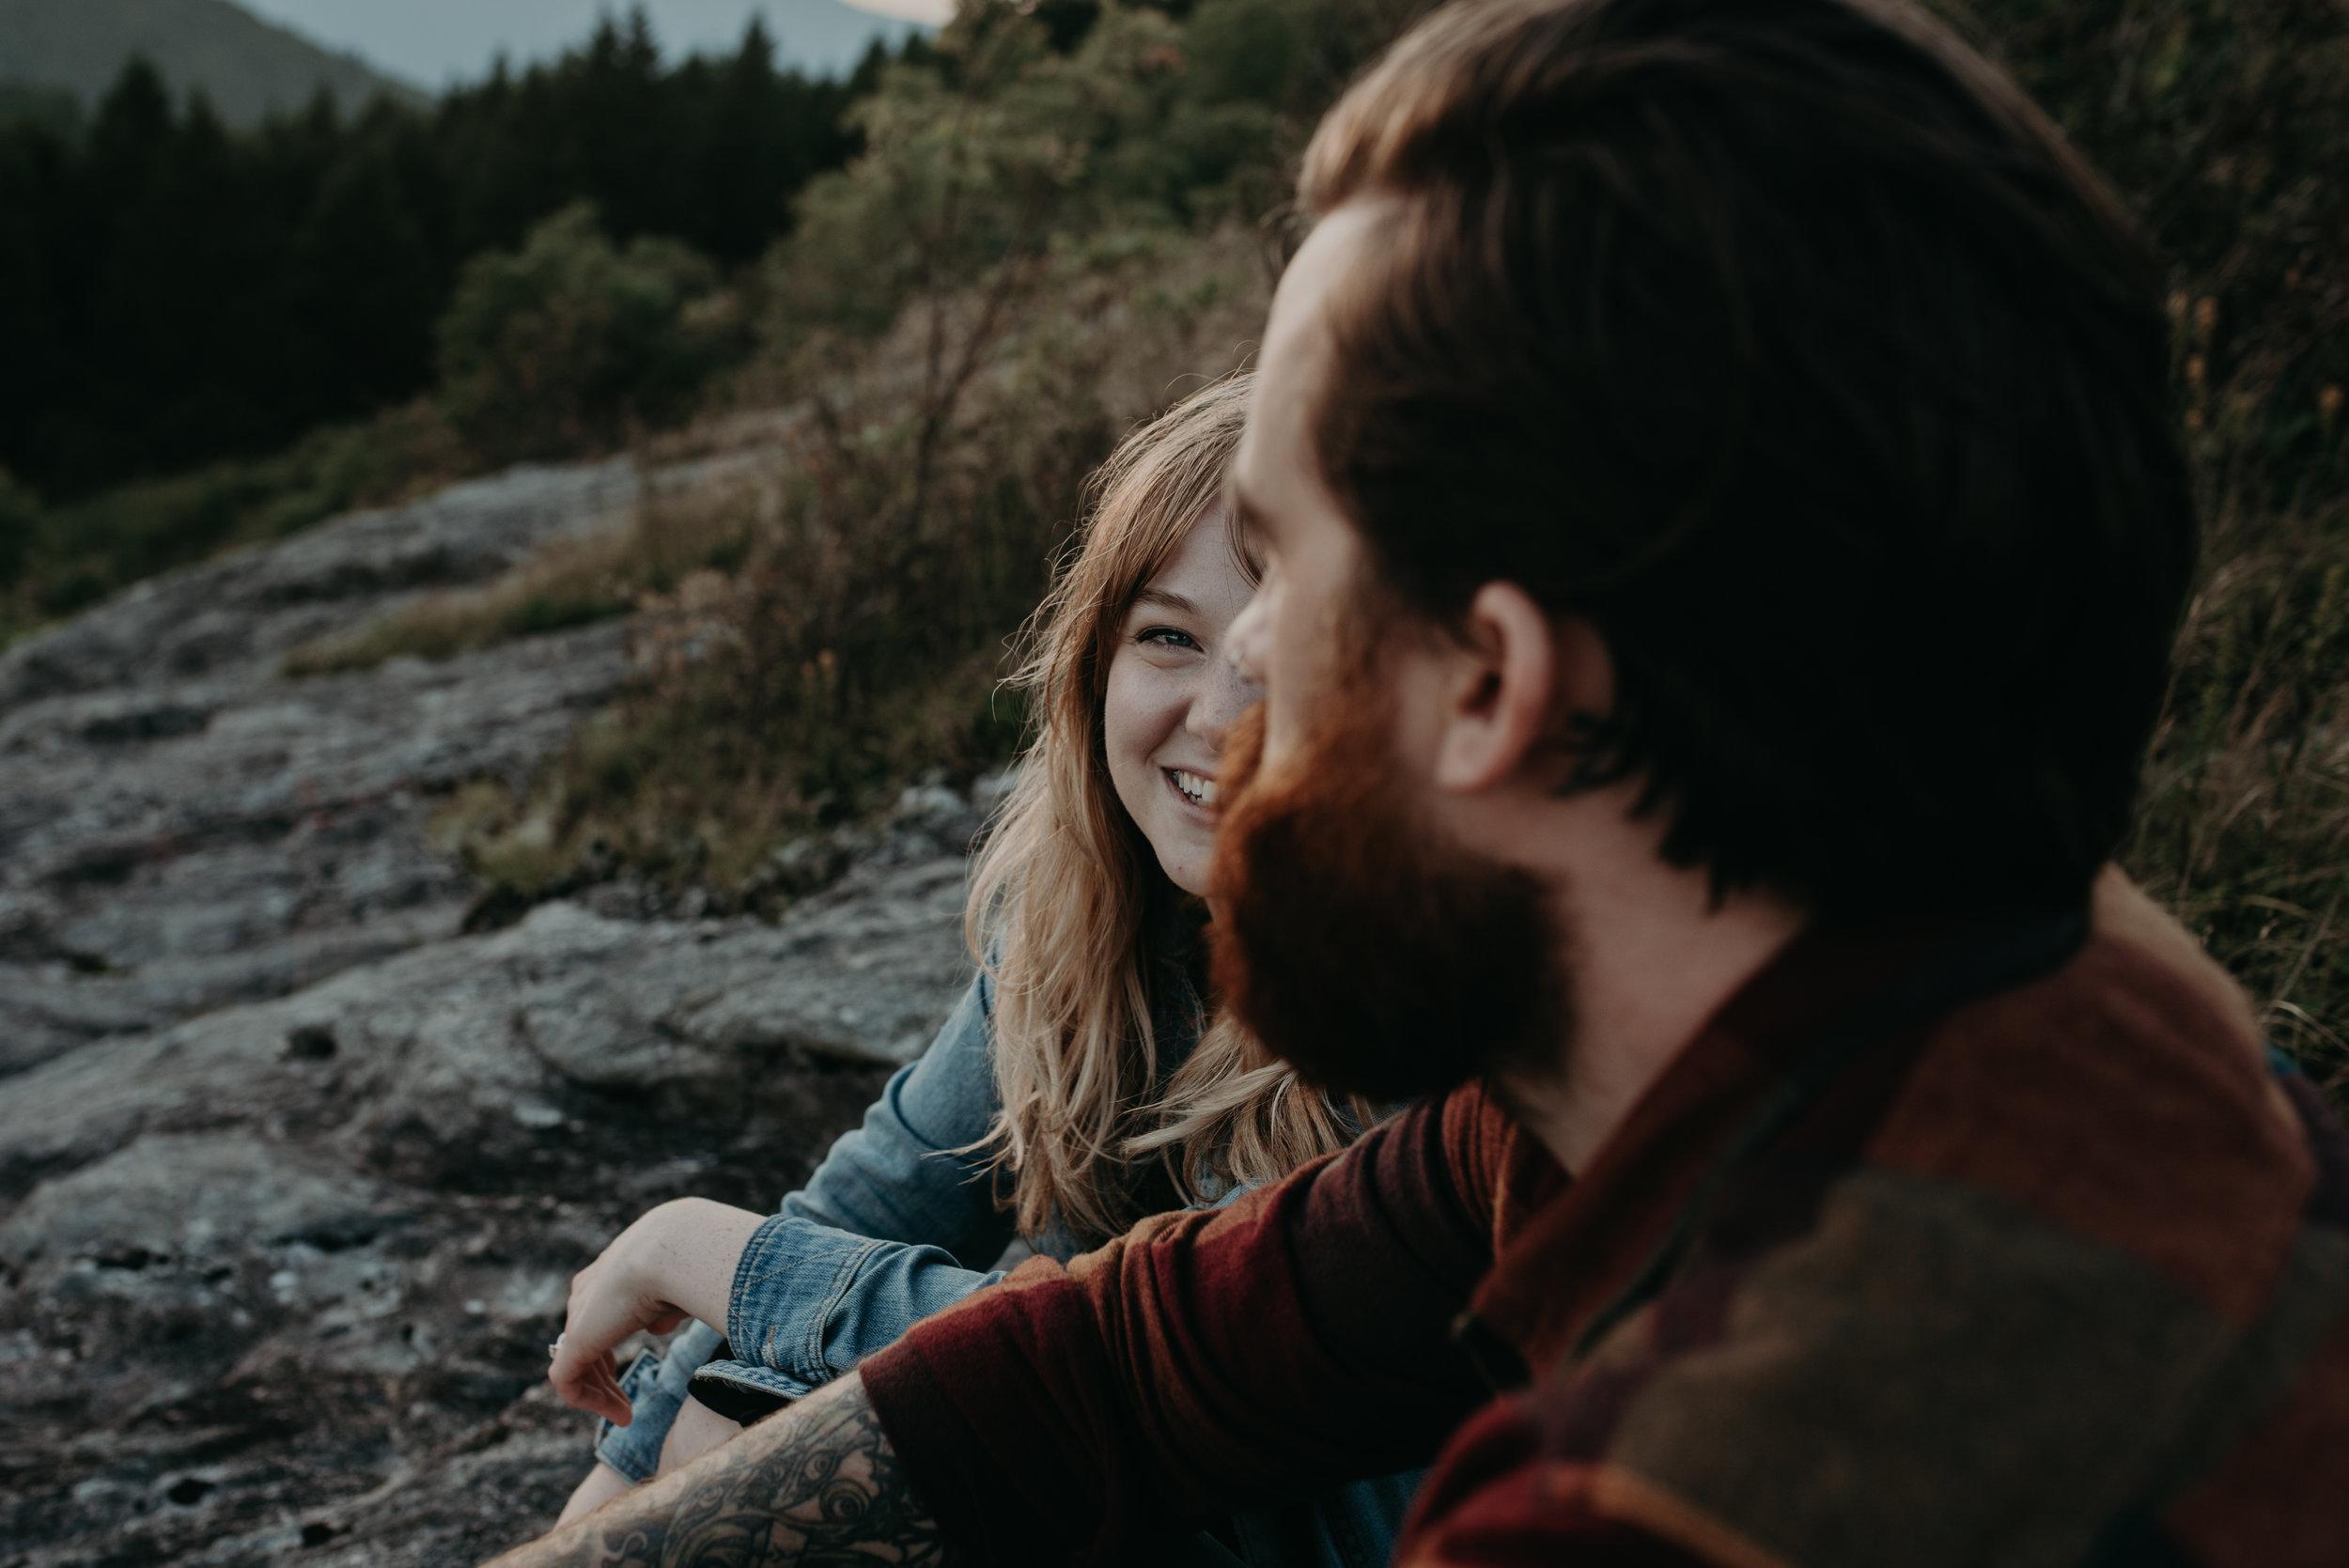 leah-joe-middleton-asheville-north-carolina-couple-session-destination-elopement-photographer-fox-and-film-149.jpg